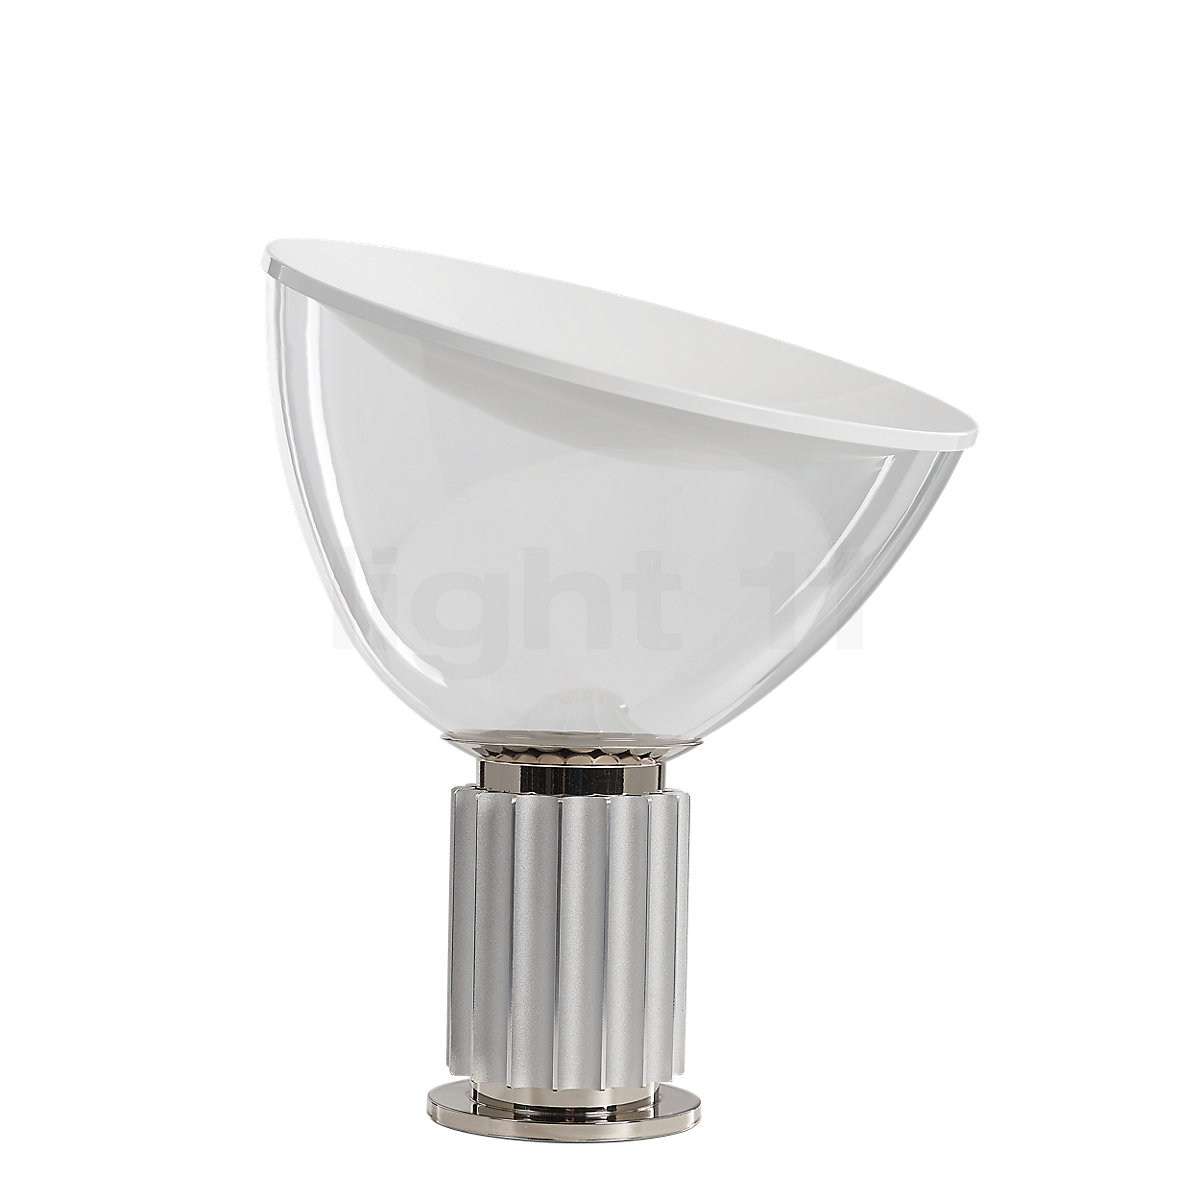 Taccia light11 small på dk Flos LED b7yYf6g